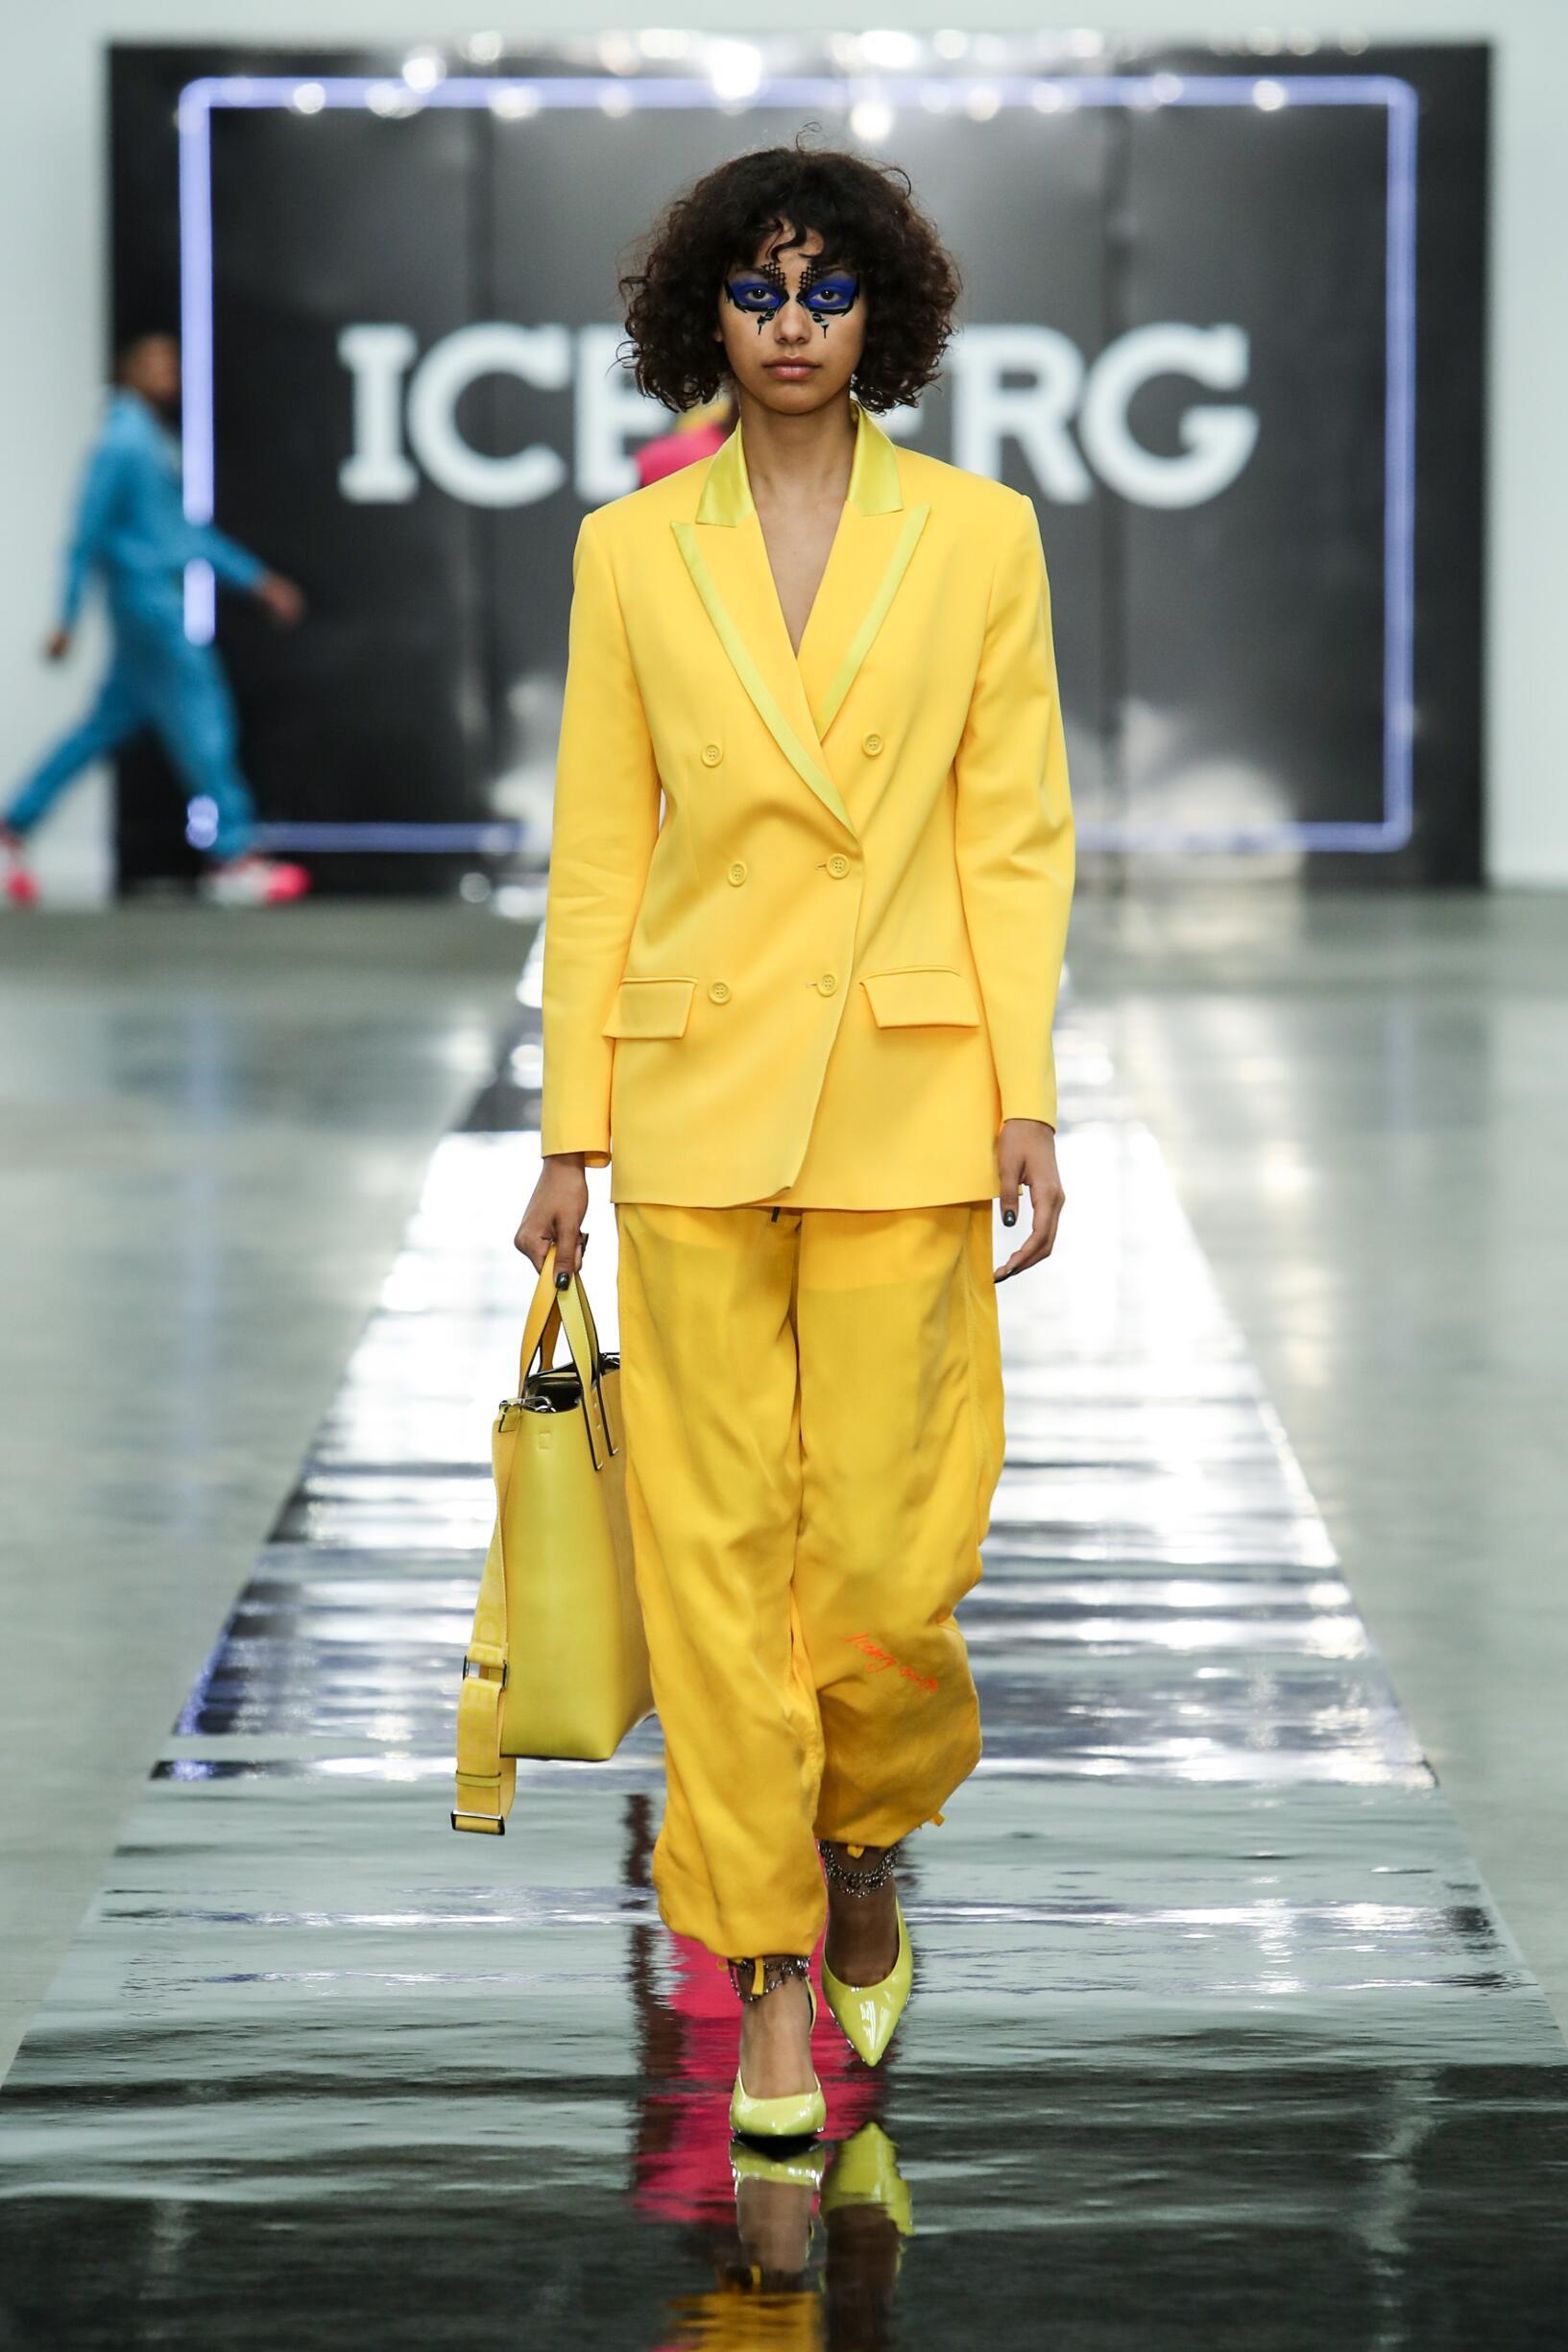 5b35c64f22e Iceberg Spring Summer 2020 Womens Collection London Fashion Week